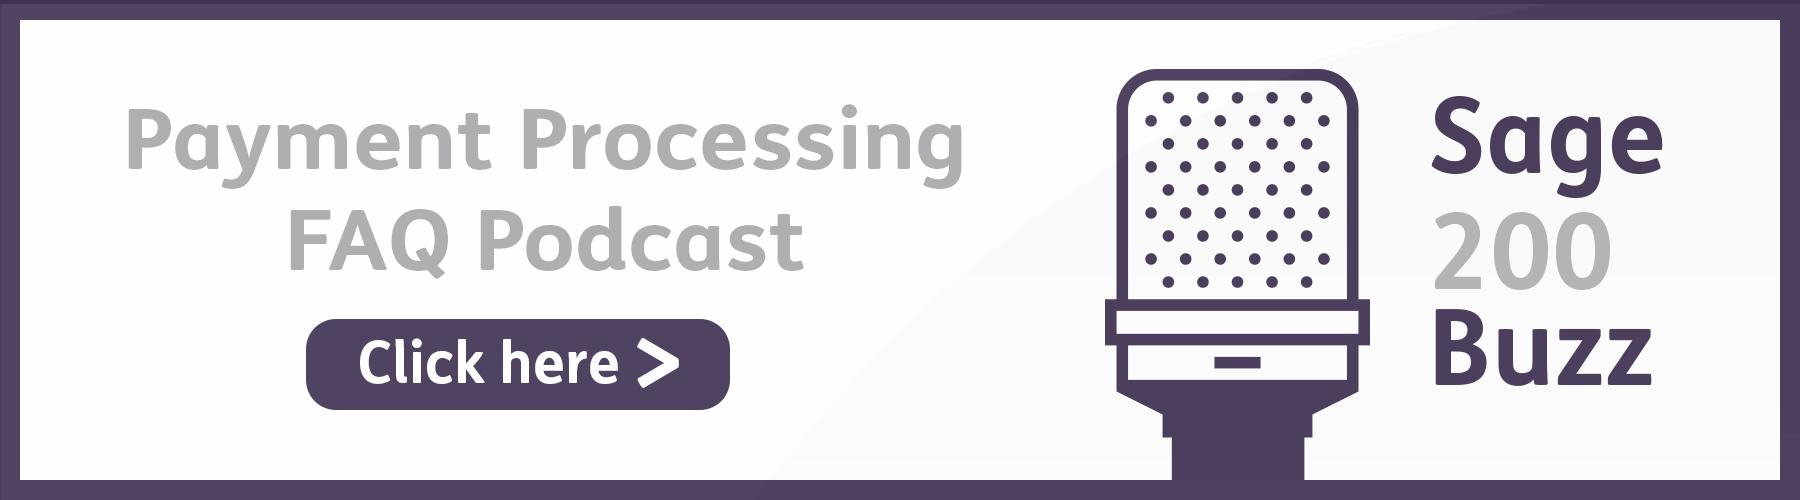 Payment processing cta FAQ